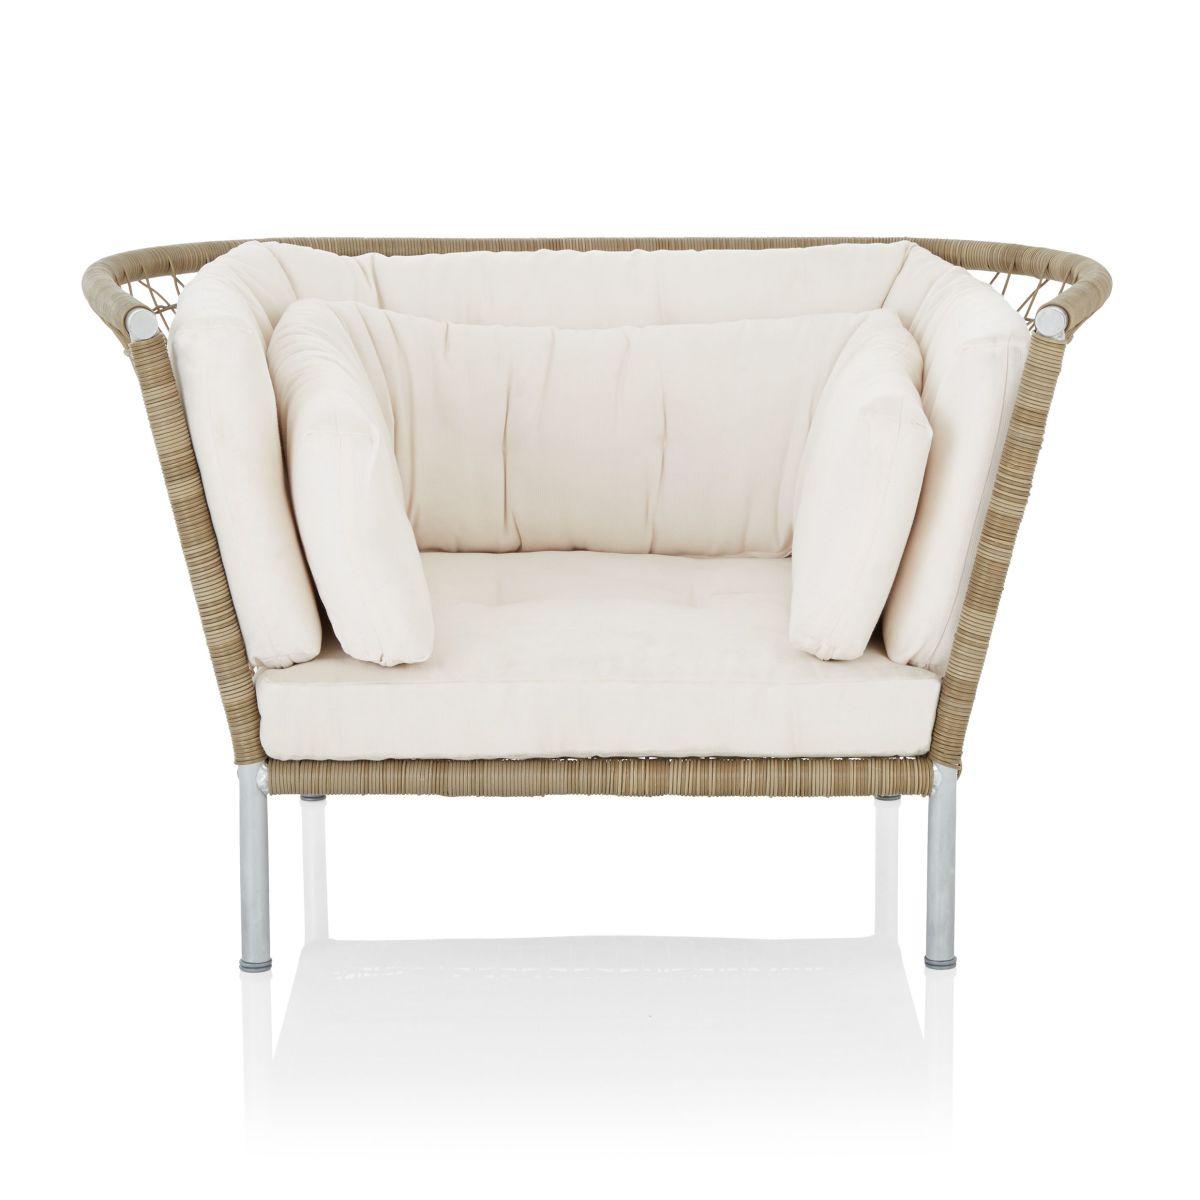 Outdoor-Sessel, inkl. Kissen, modern, Stahl, Kunststoffgeflecht, Polyester (Impressionen)